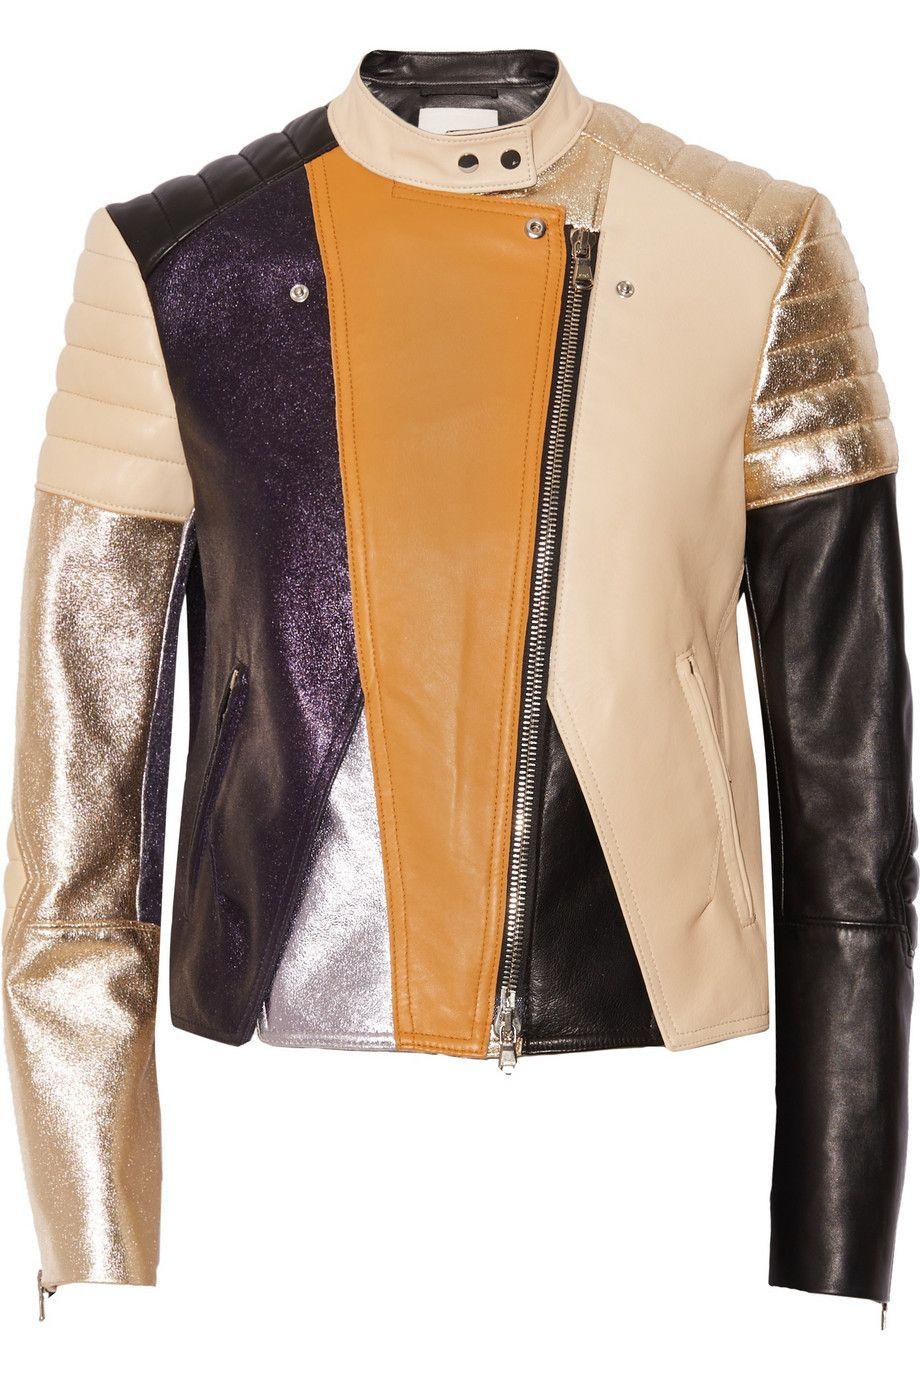 Colorblock leather biker jacket Blue 3.1 Phillip Lim